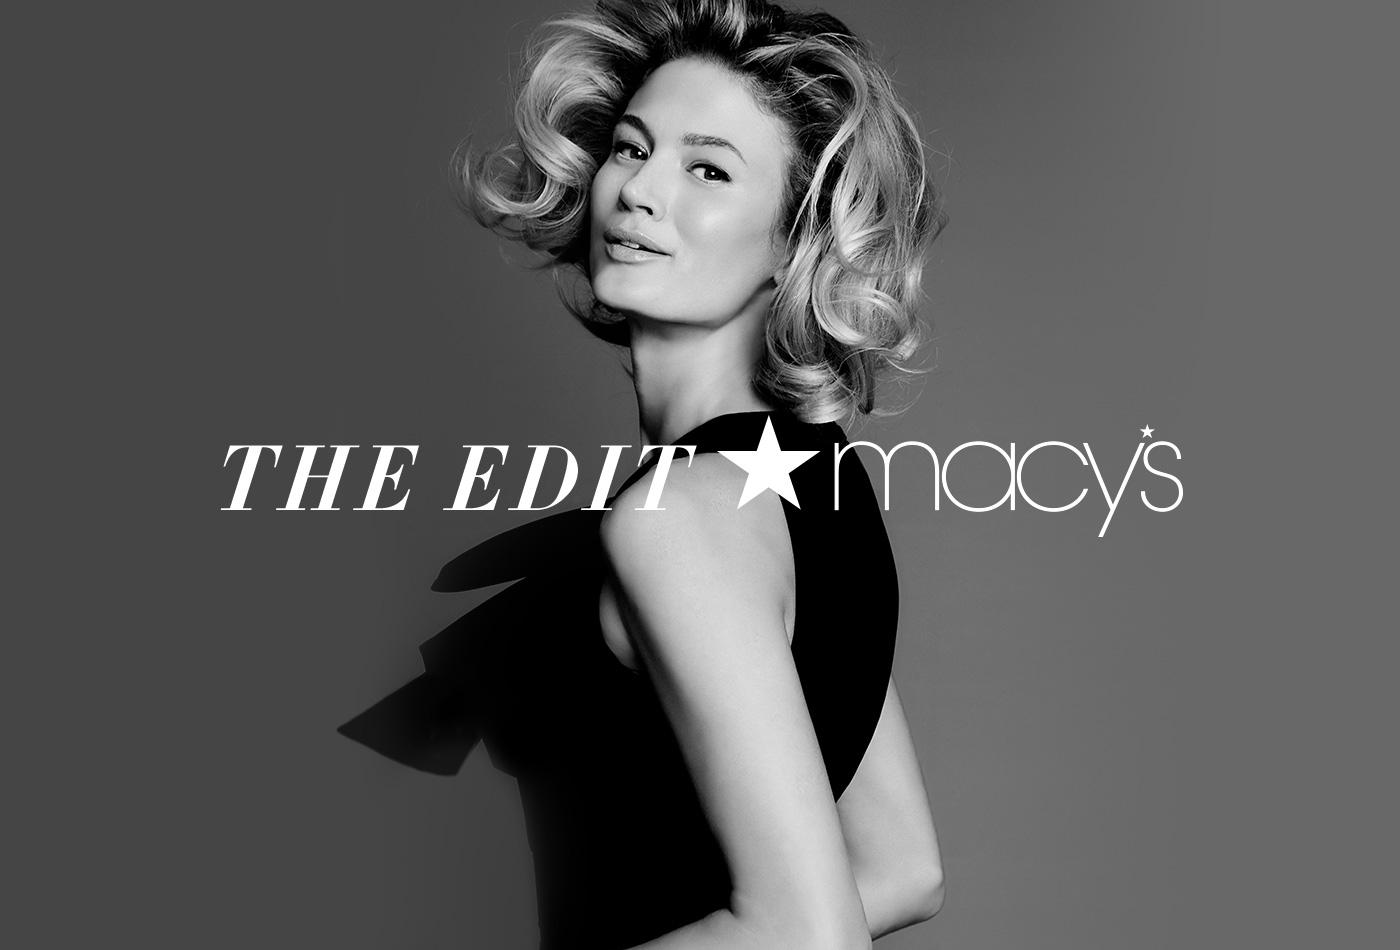 Macy's The Edit